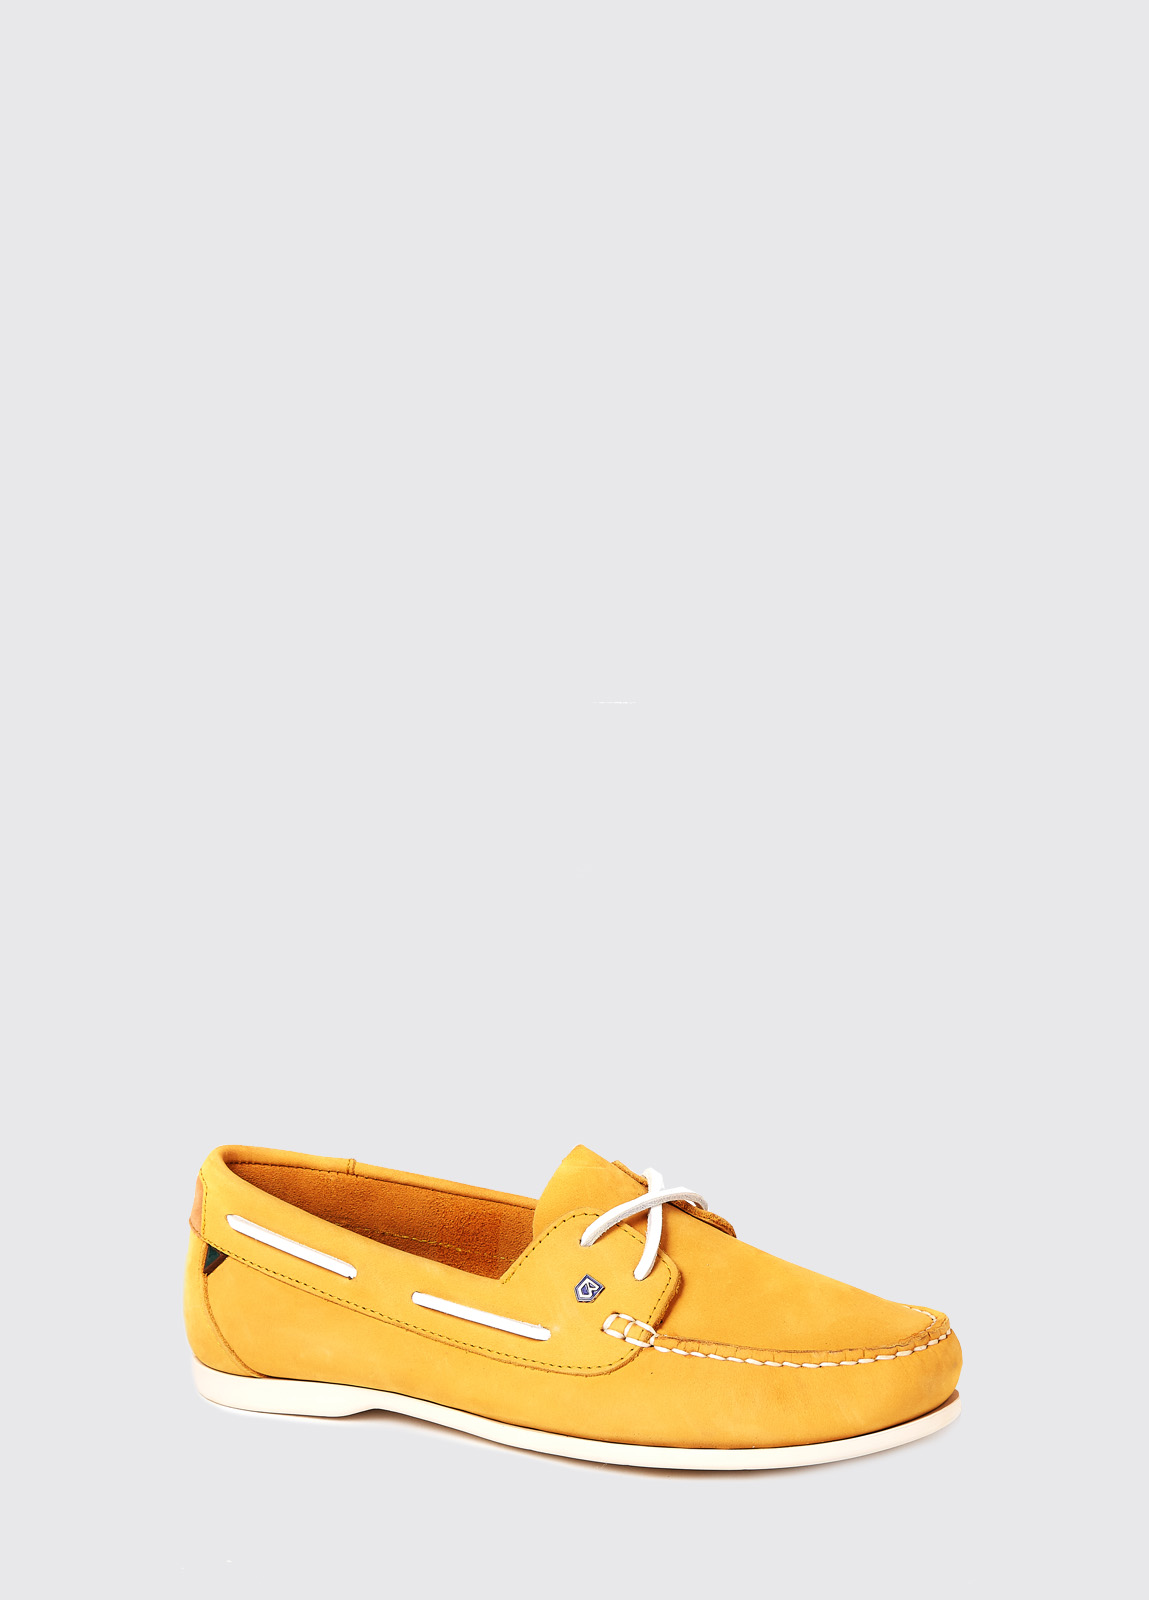 Aruba Deck Shoe - Sunflower